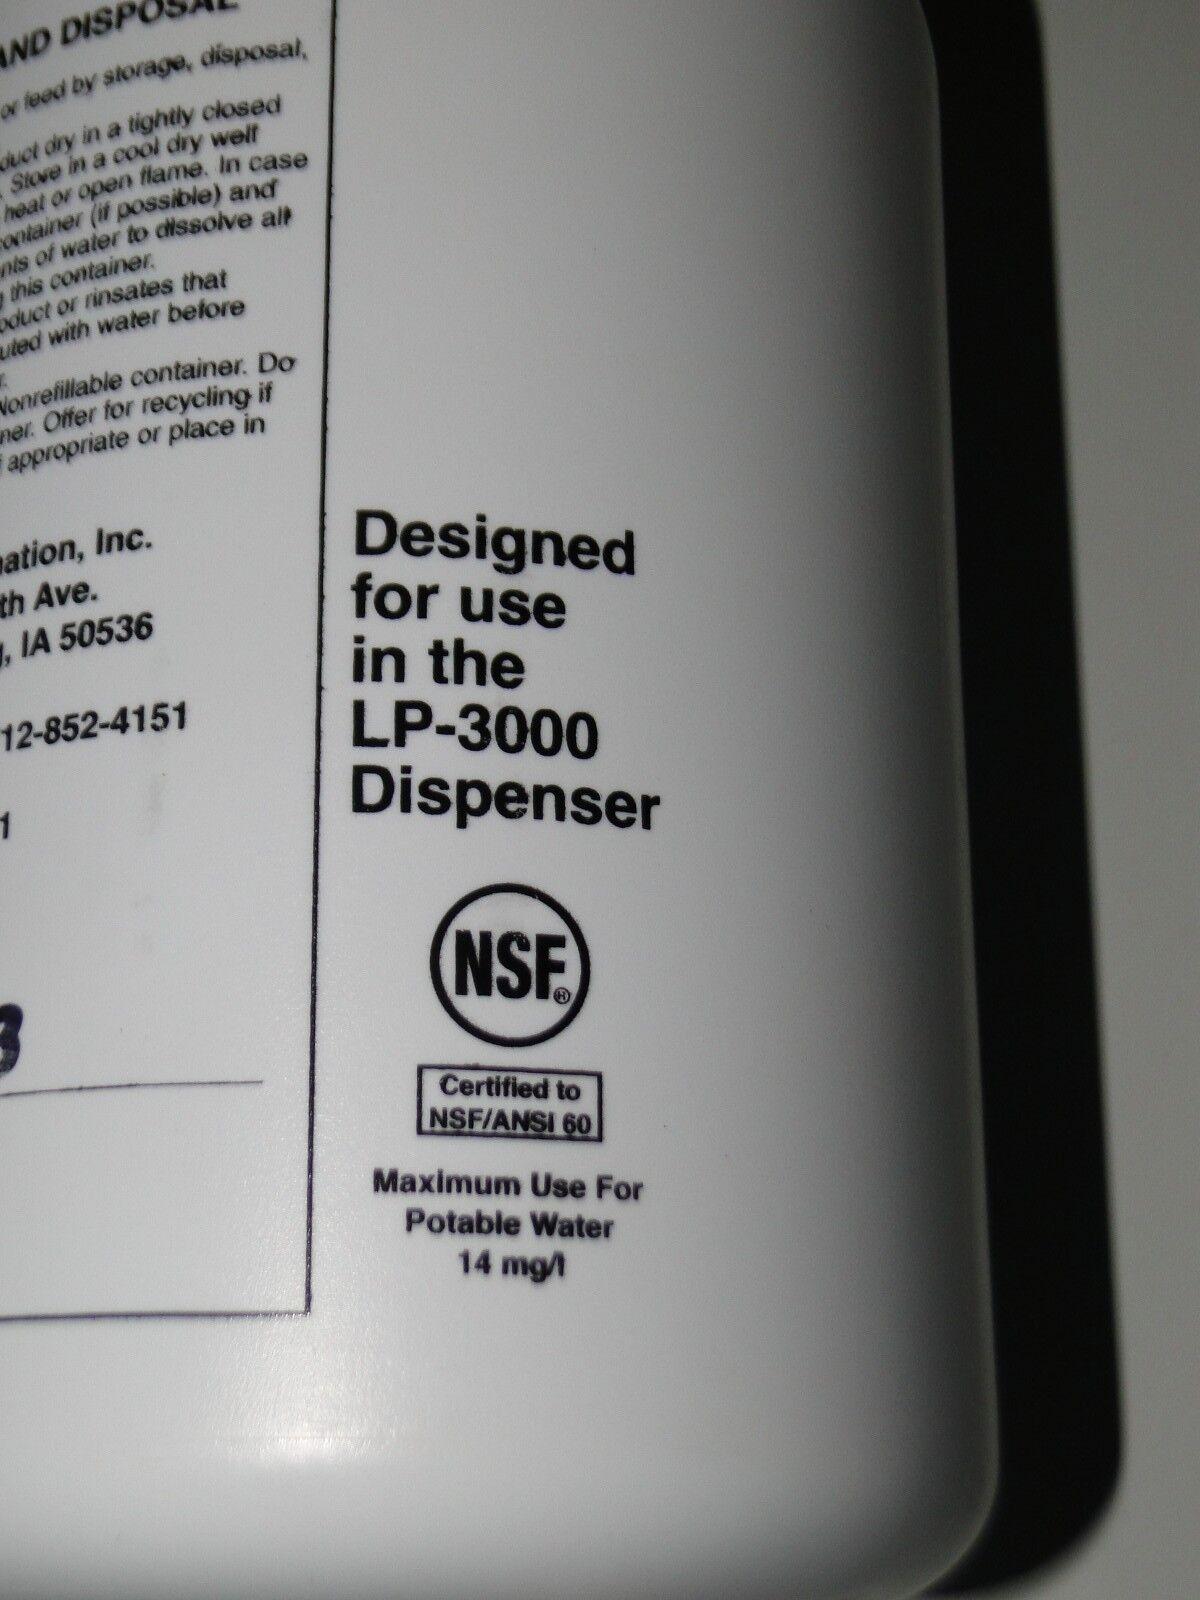 WELL POOL CHLORINE SANITIZER PELLET PENTAIR LP-3000 LANDOMATIC DRY CHLORINATOR